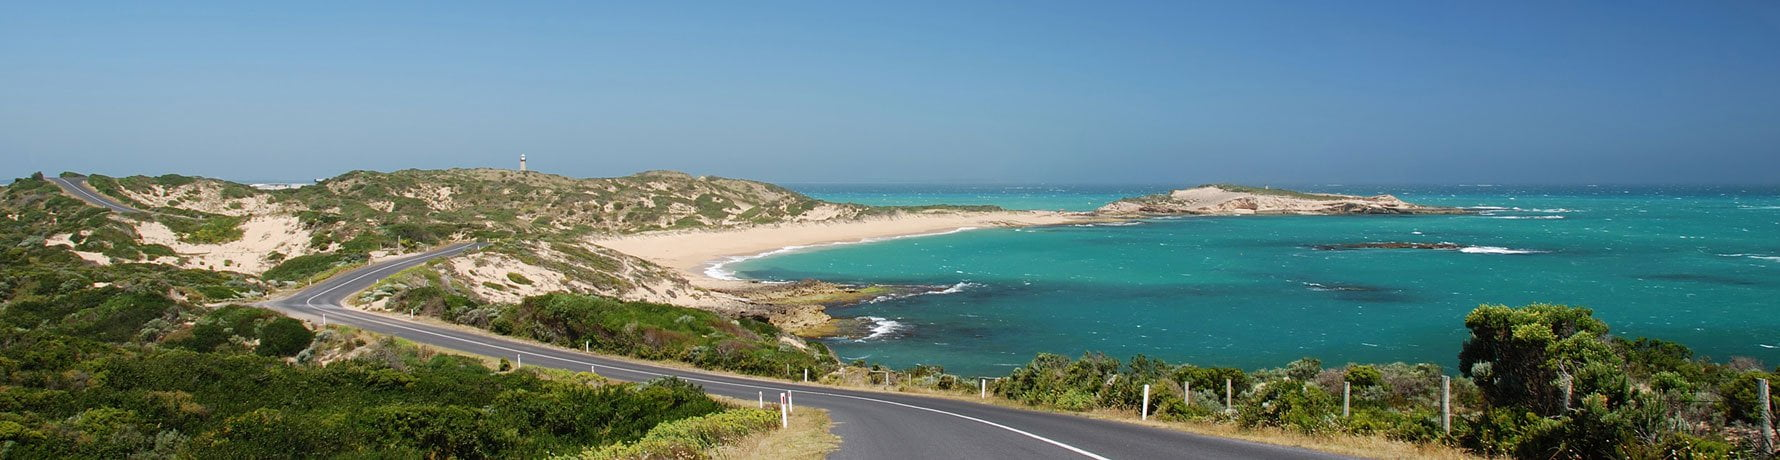 Australia Tropicale: Sunshine Coast!